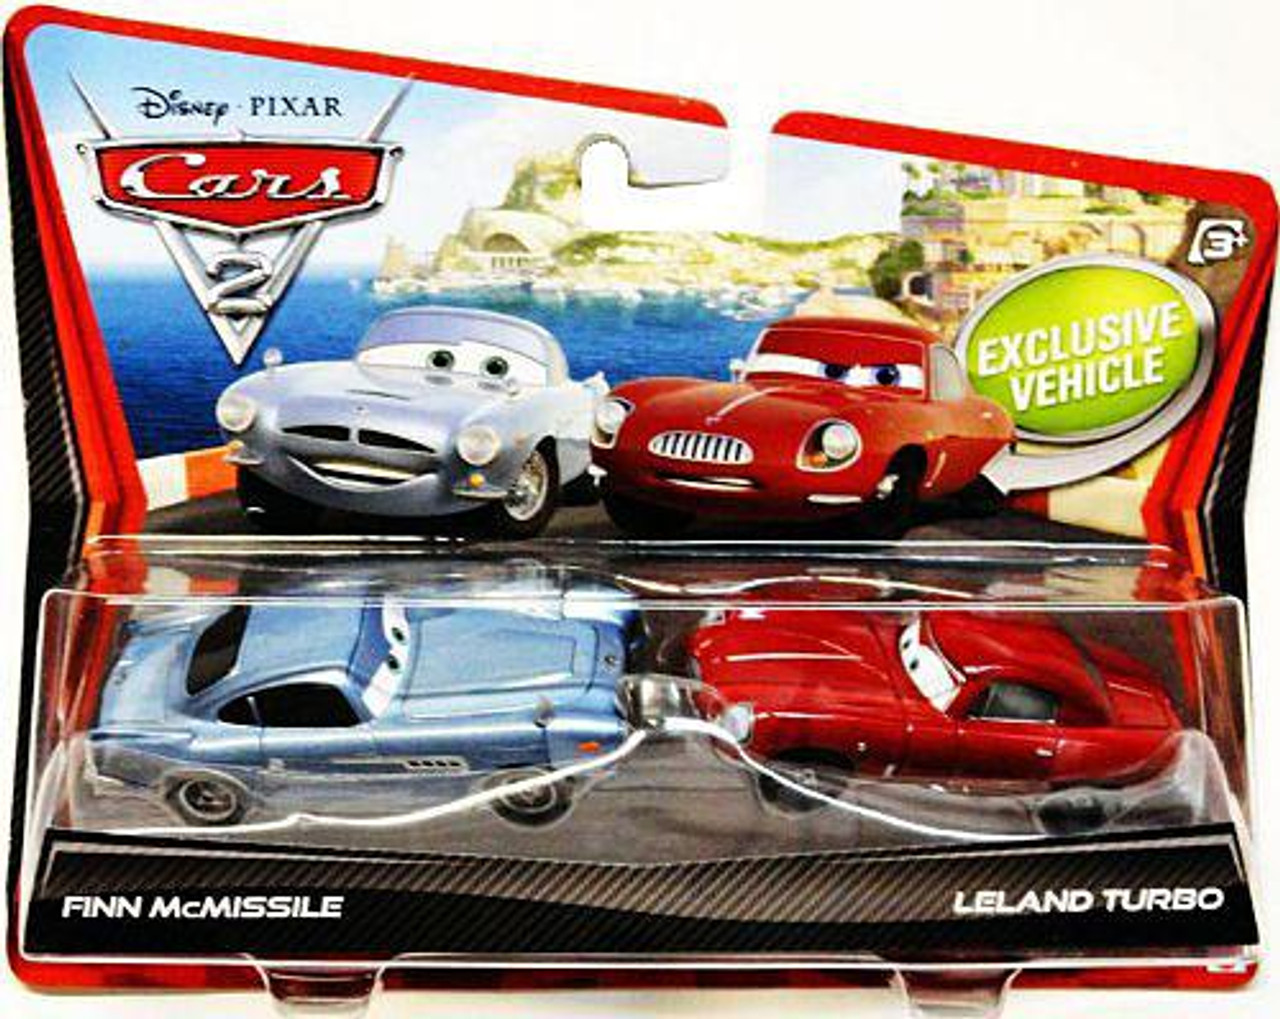 Disney Pixar Cars Cars 2 Finn Mcmissile Leland Turbo 155 Diecast Car 2 Pack Mattel Toys Toywiz